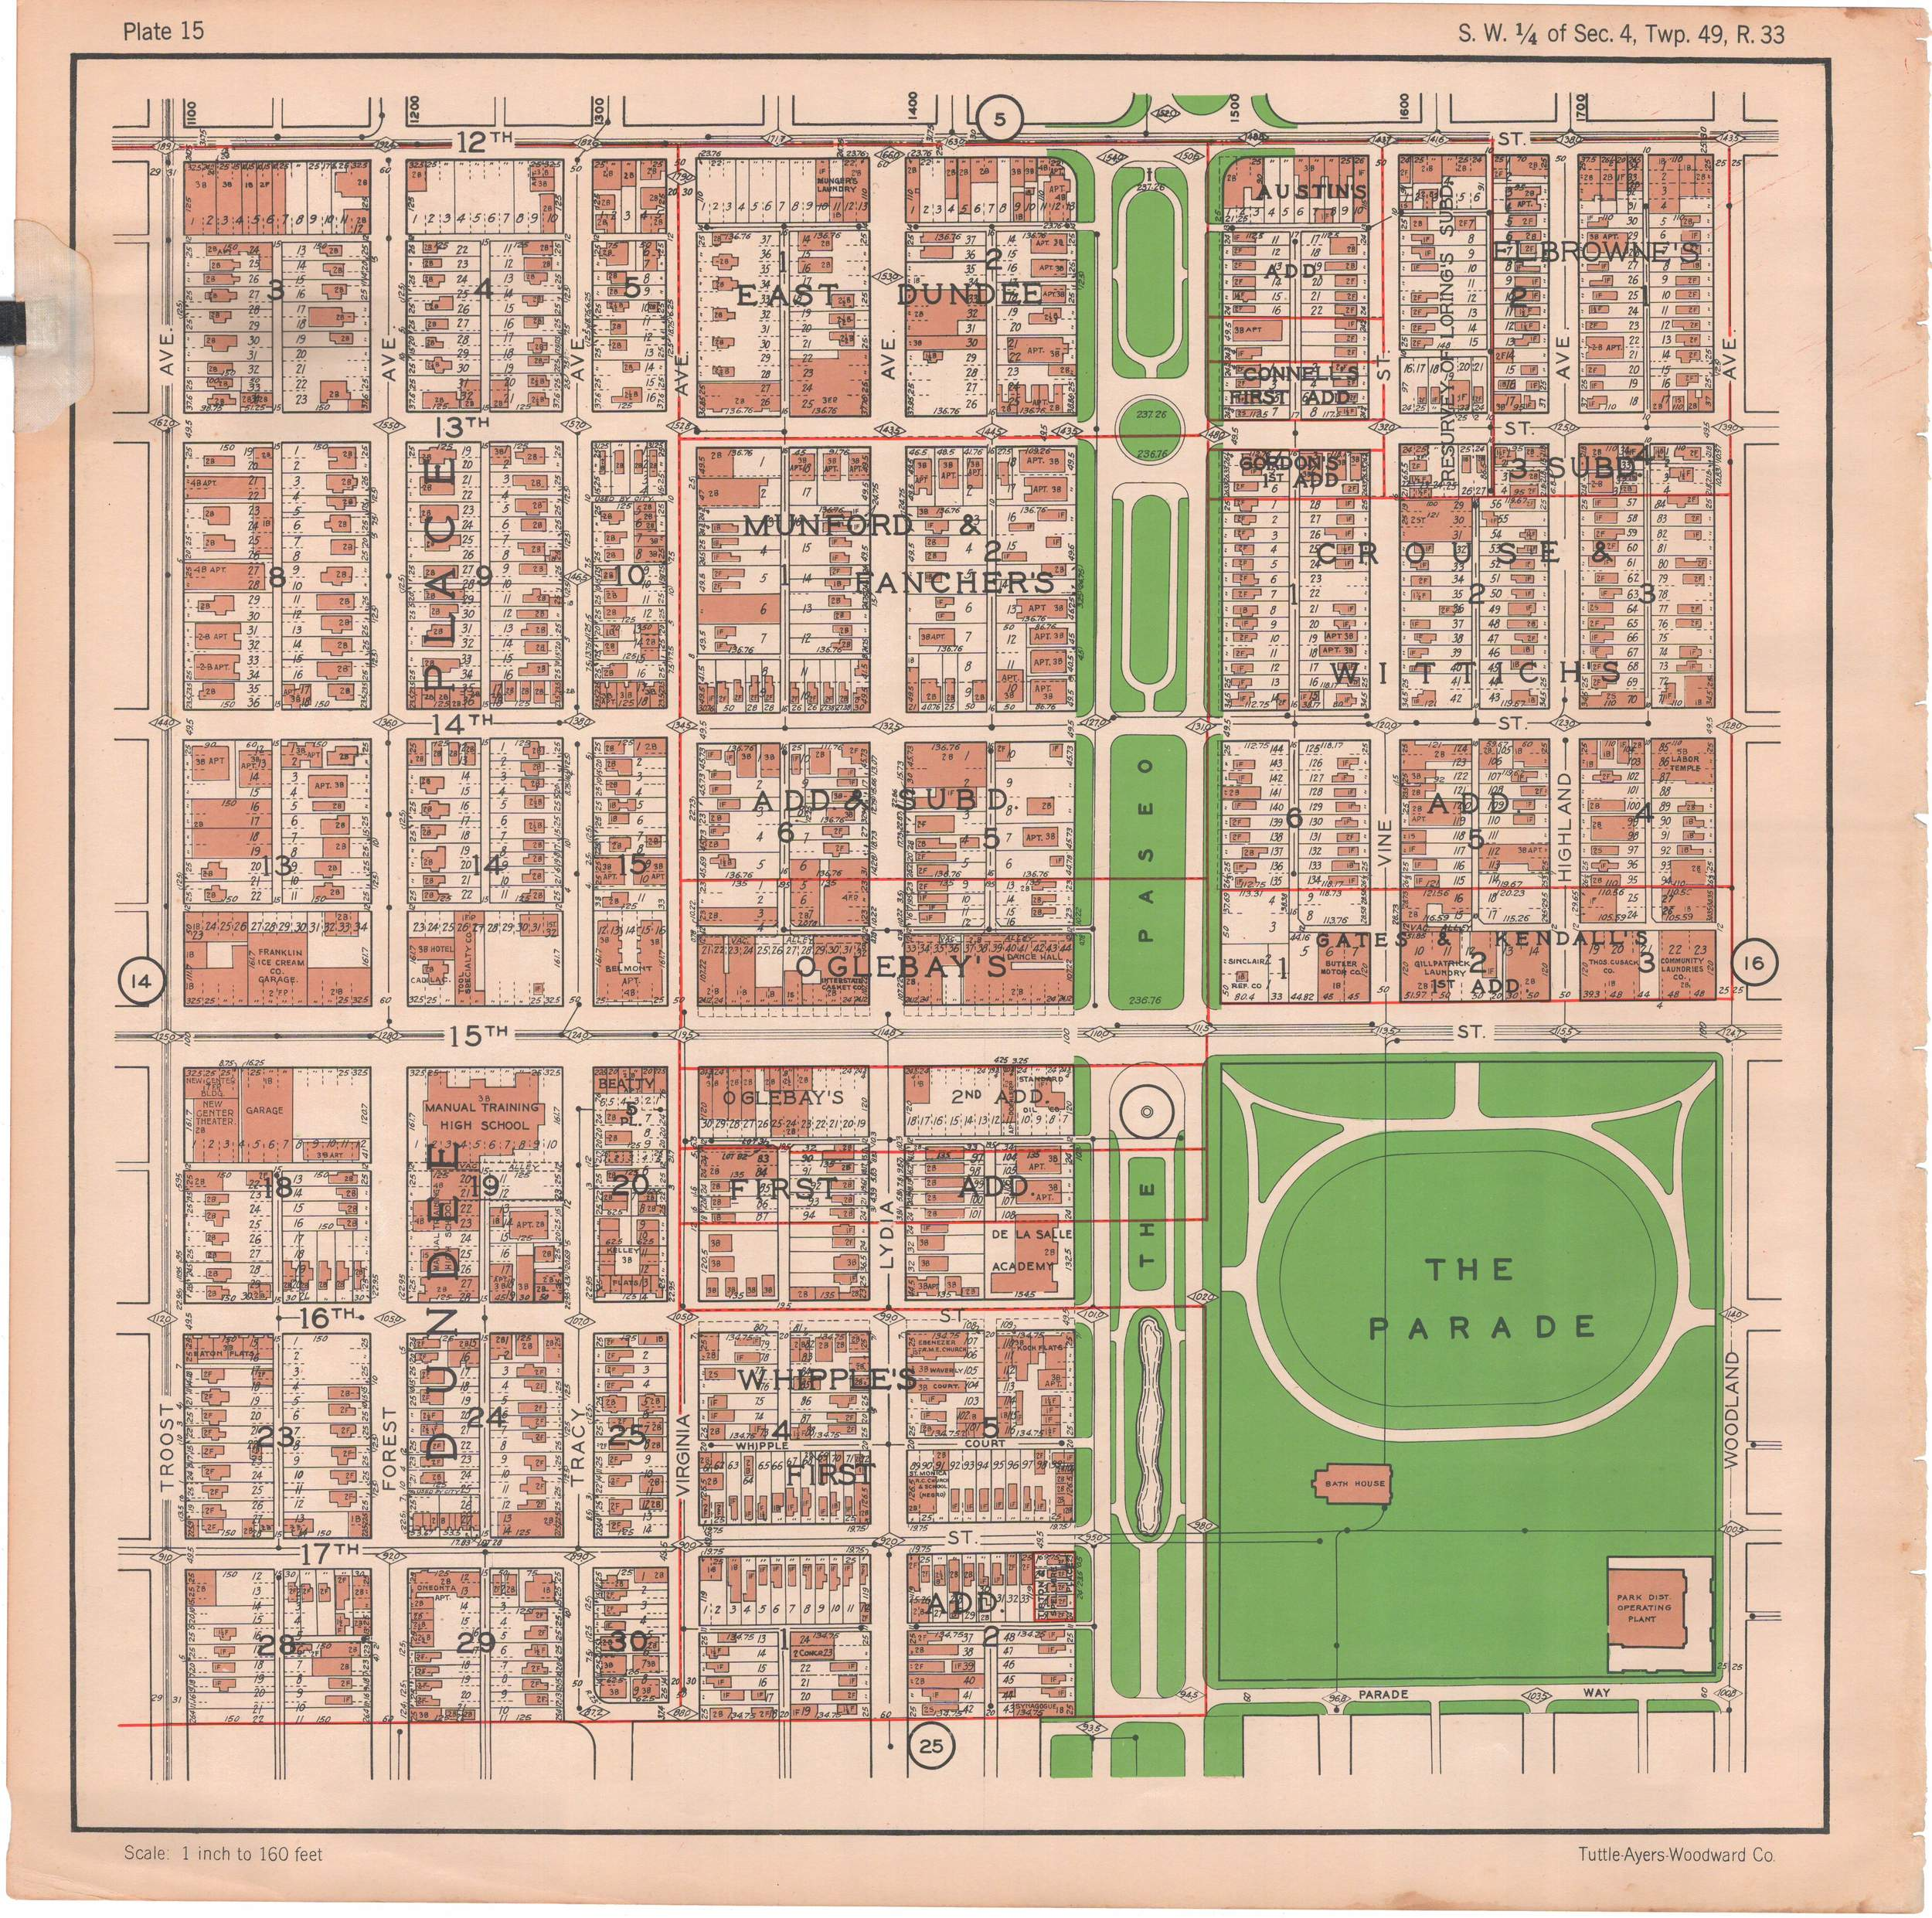 1925 TUTTLE_AYERS_Plate 15.JPG